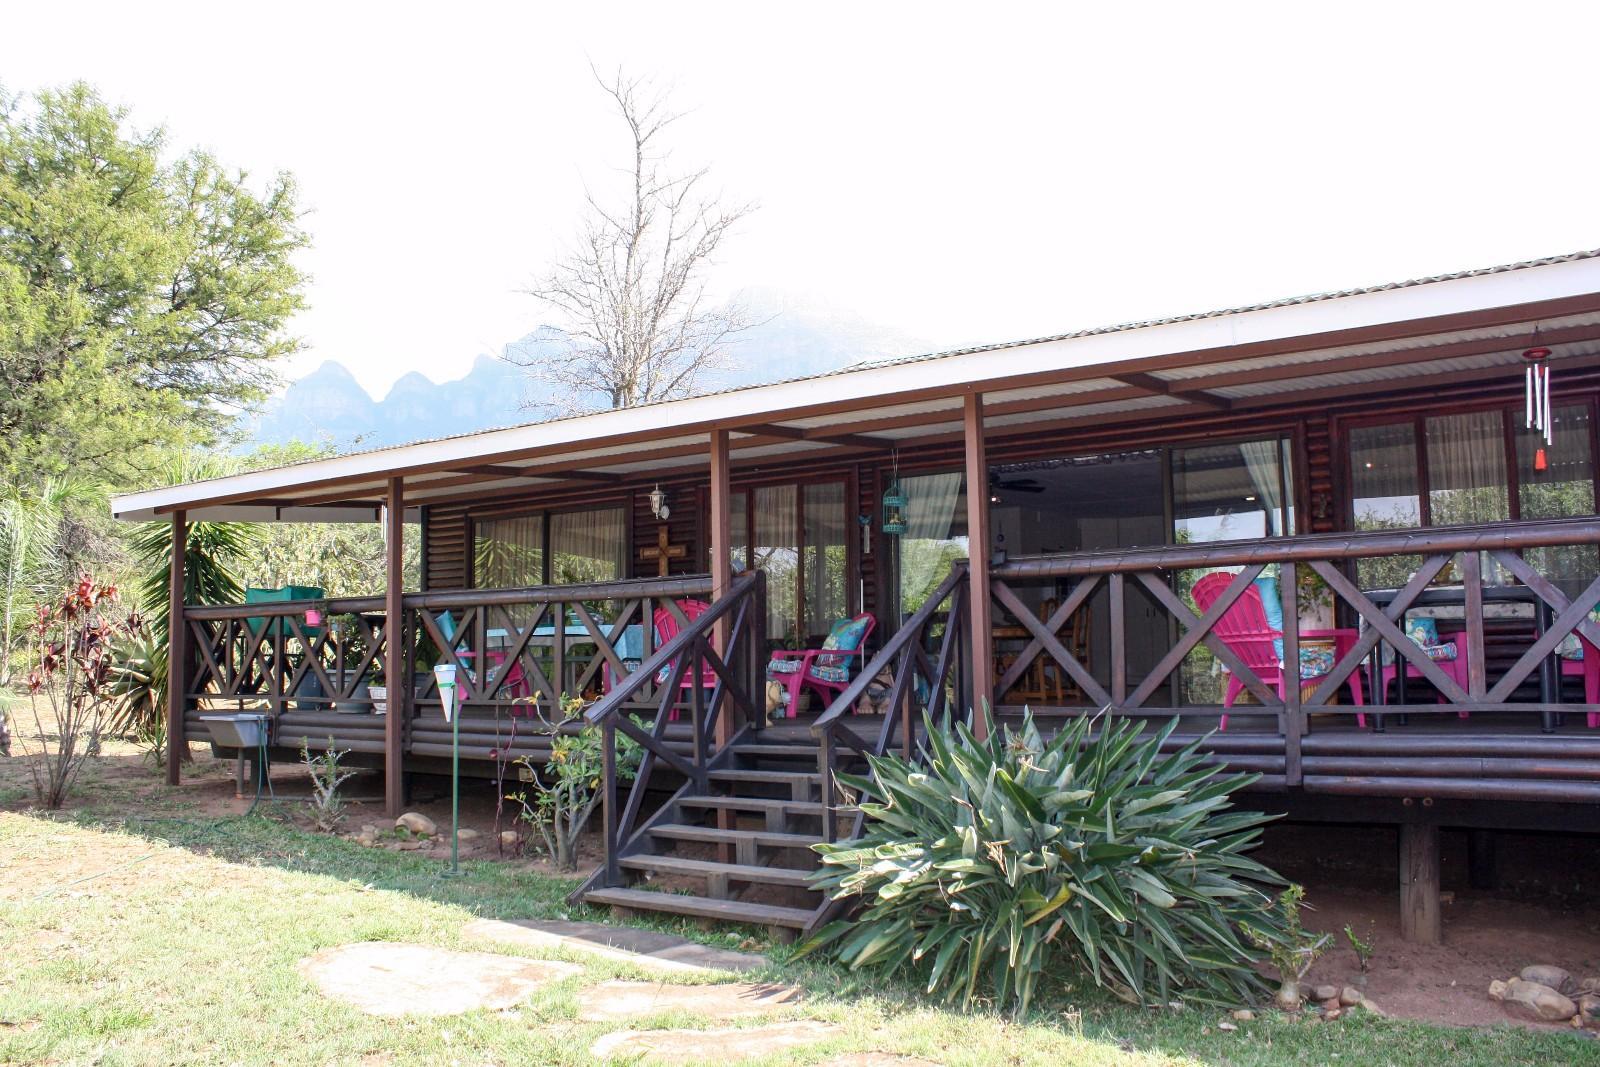 Hoedspruit, Kampersrus Property  | Houses For Sale Kampersrus, KAMPERSRUS, House 3 bedrooms property for sale Price:1,100,000